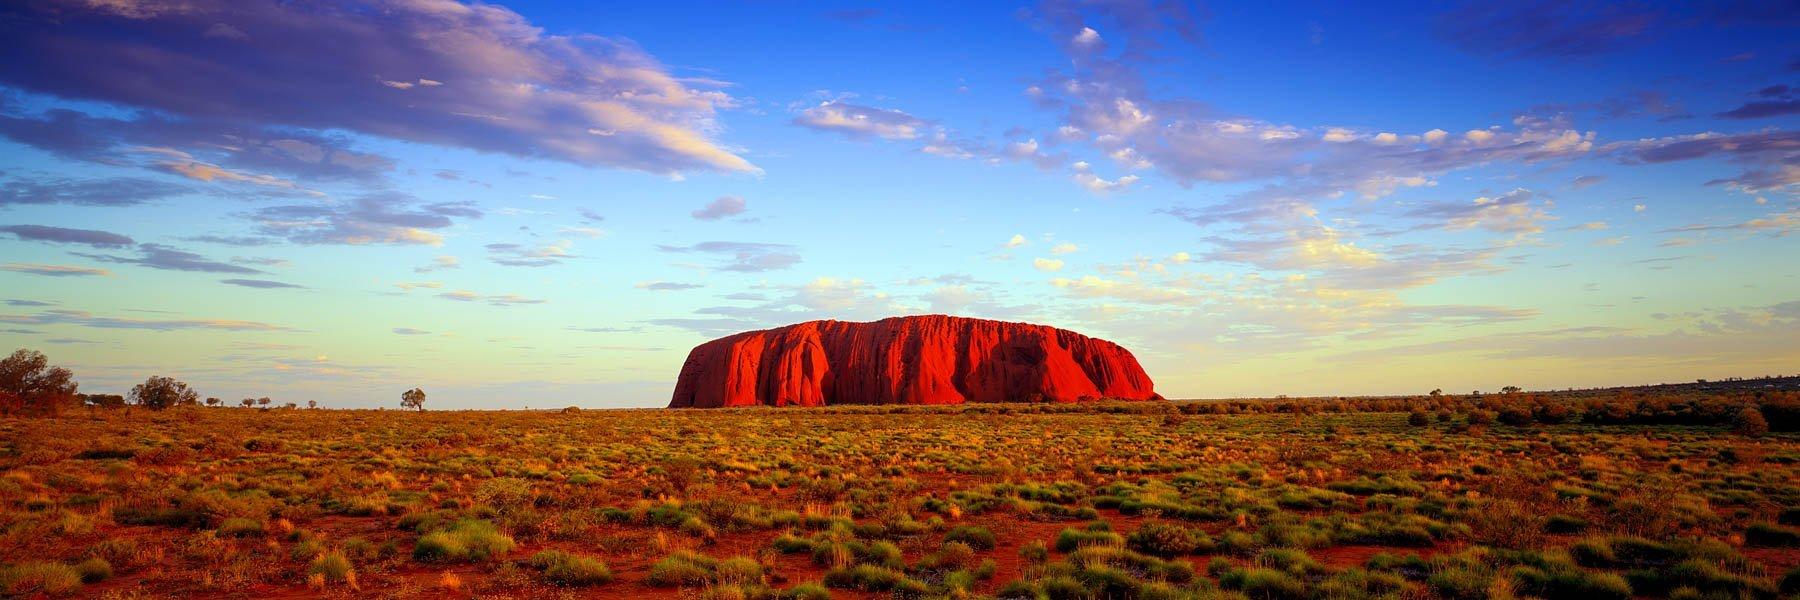 Uluru glowing red in the desert sunshine, NT, Australia.